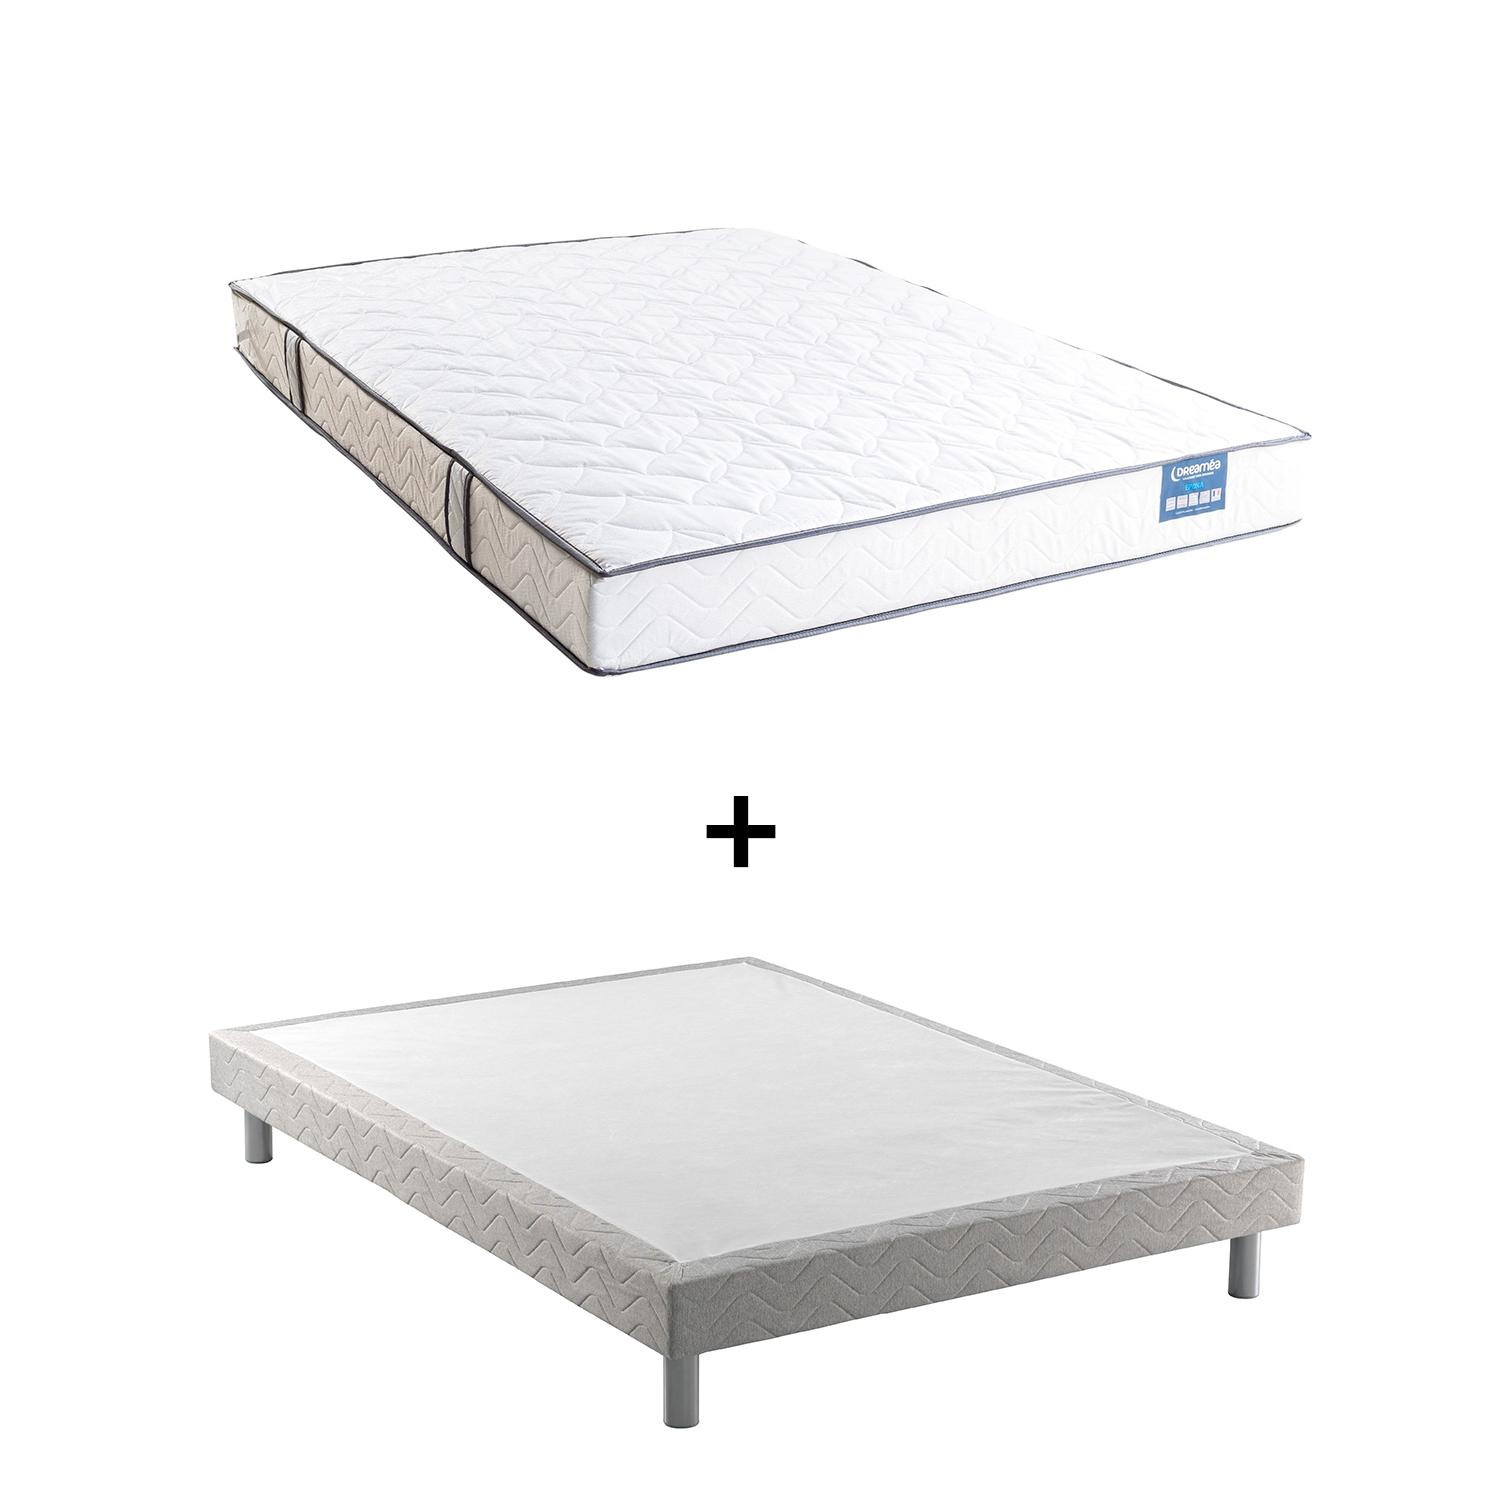 sommier d co gris strenan 90x190 cm sommiers but. Black Bedroom Furniture Sets. Home Design Ideas